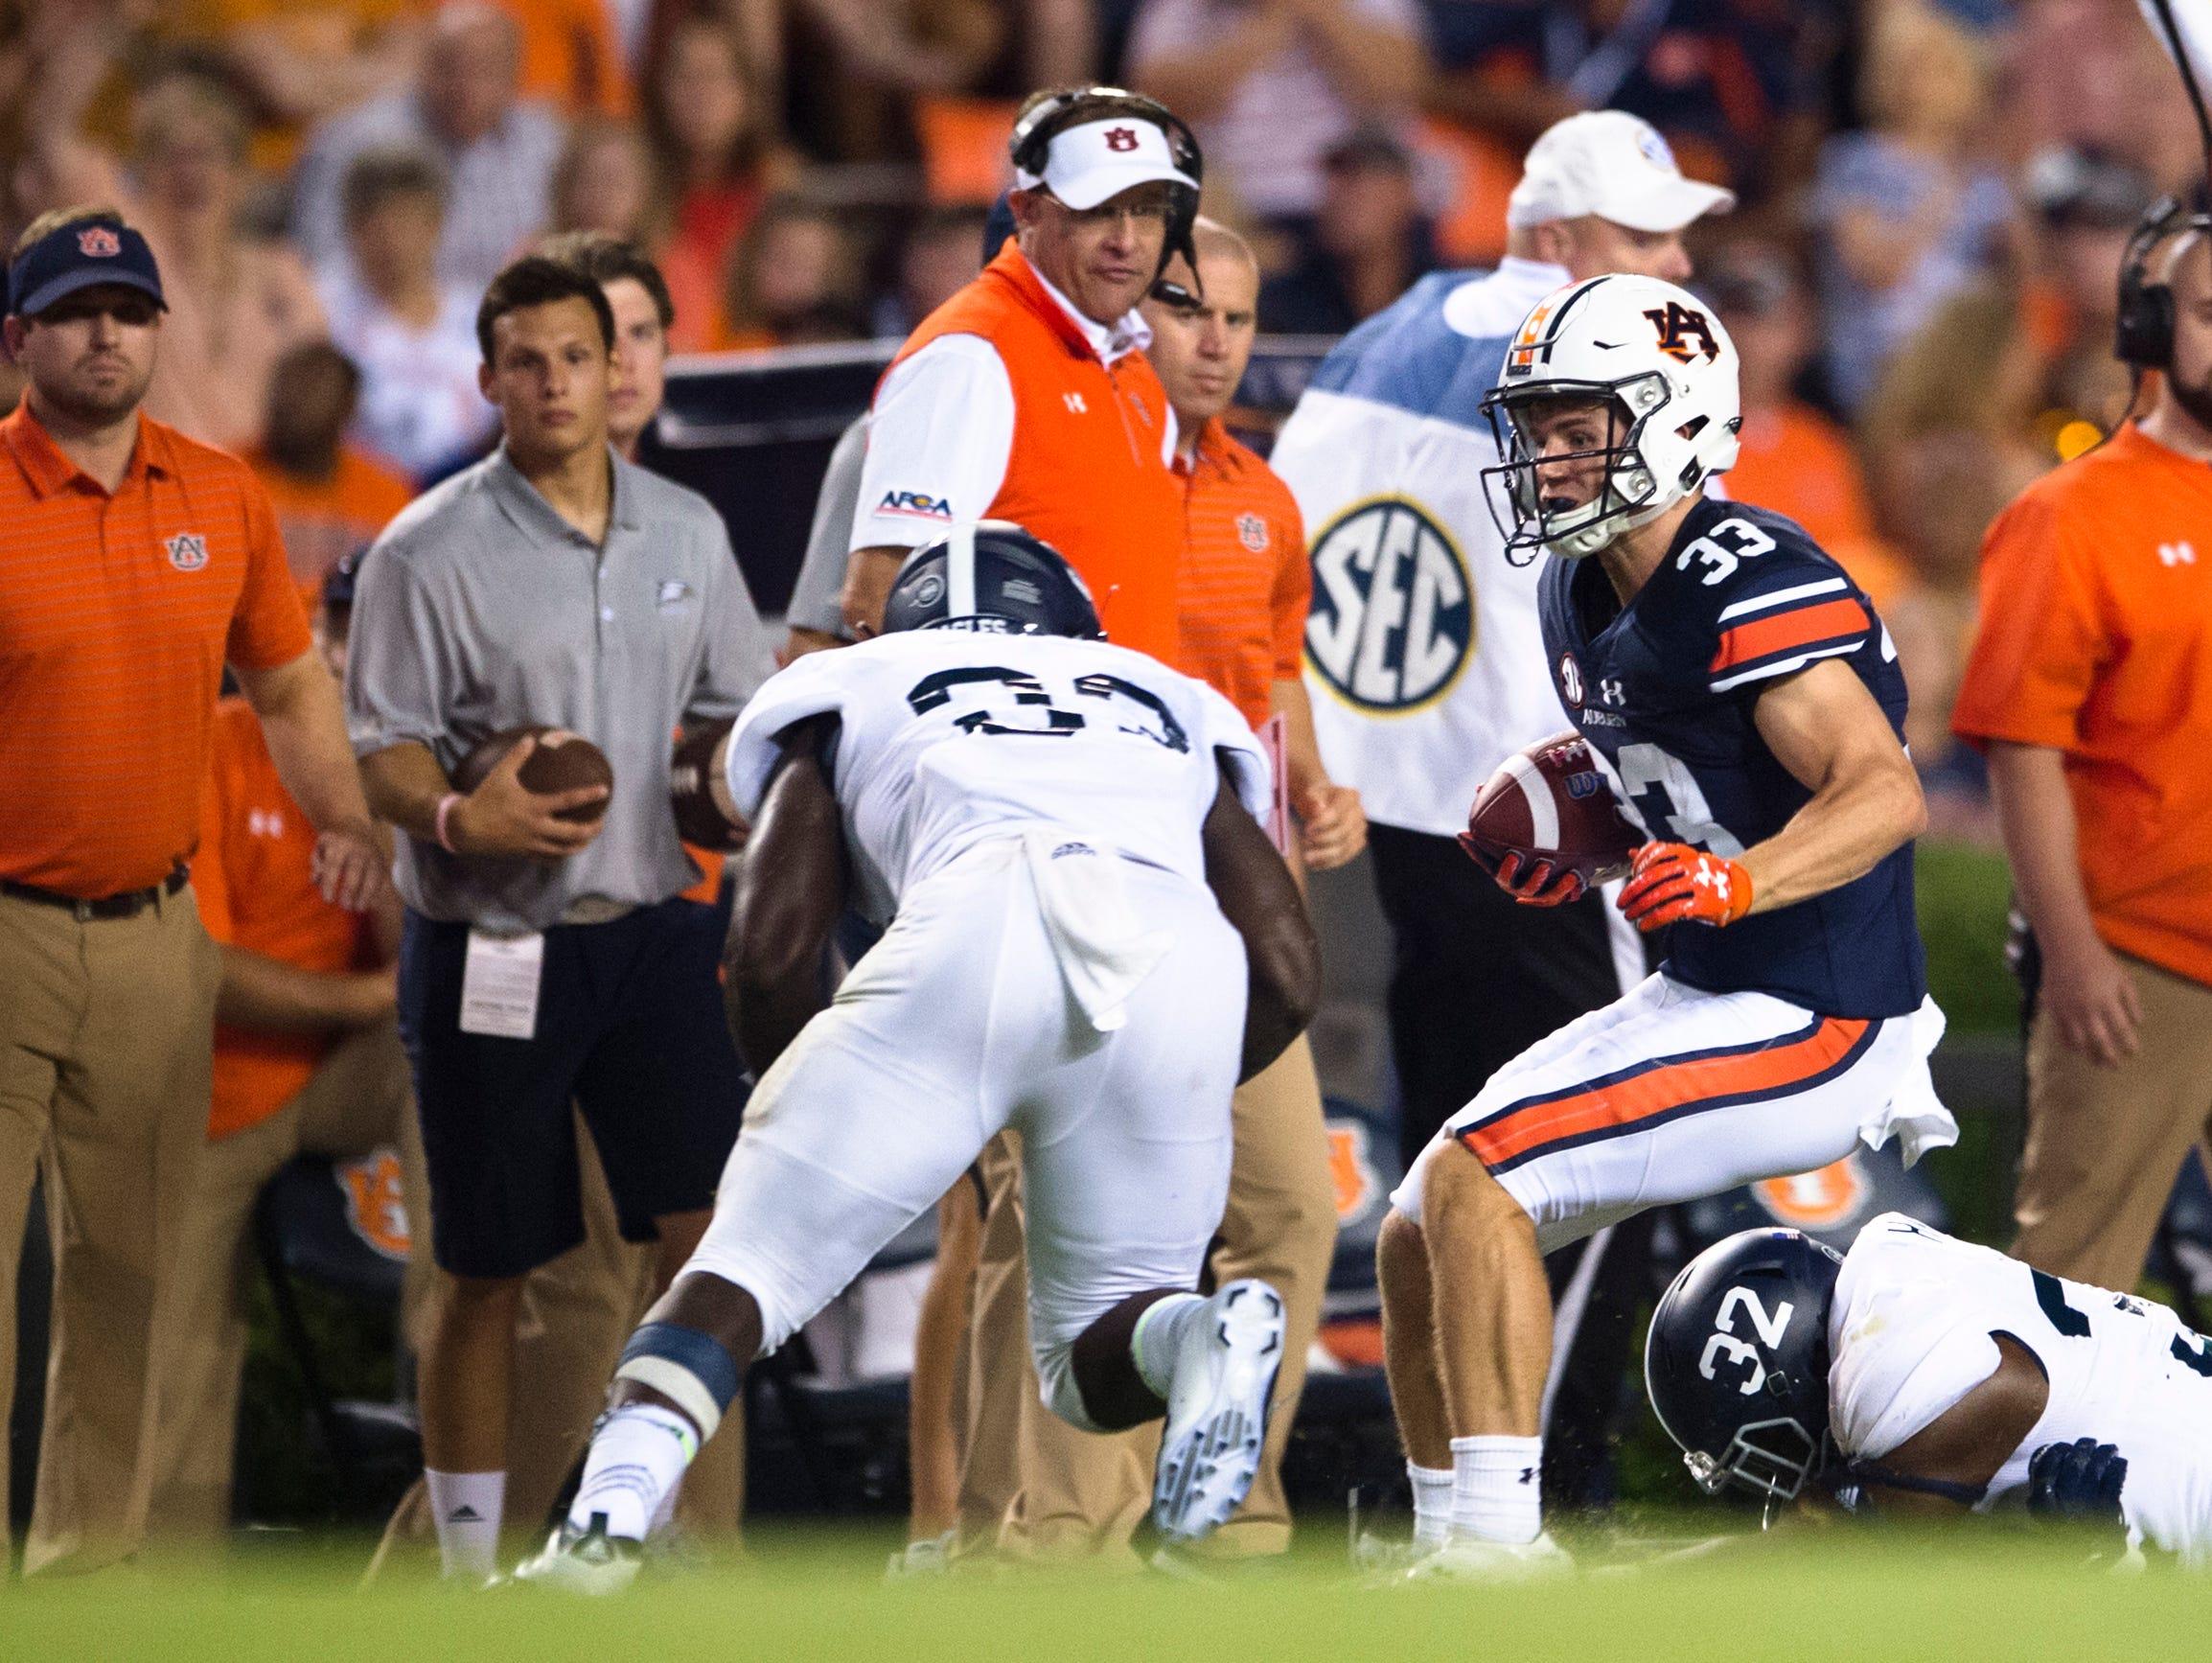 Auburn wide receiver Will Hastings (33) is hit by Georgia Southern linebacker Chris Harris Jr. (32) during the NCAA football game between Auburn vs. Georgia Southern on Saturday, Sept. 2, 2017, at Jordan Hare Stadium in Auburn, Ala.